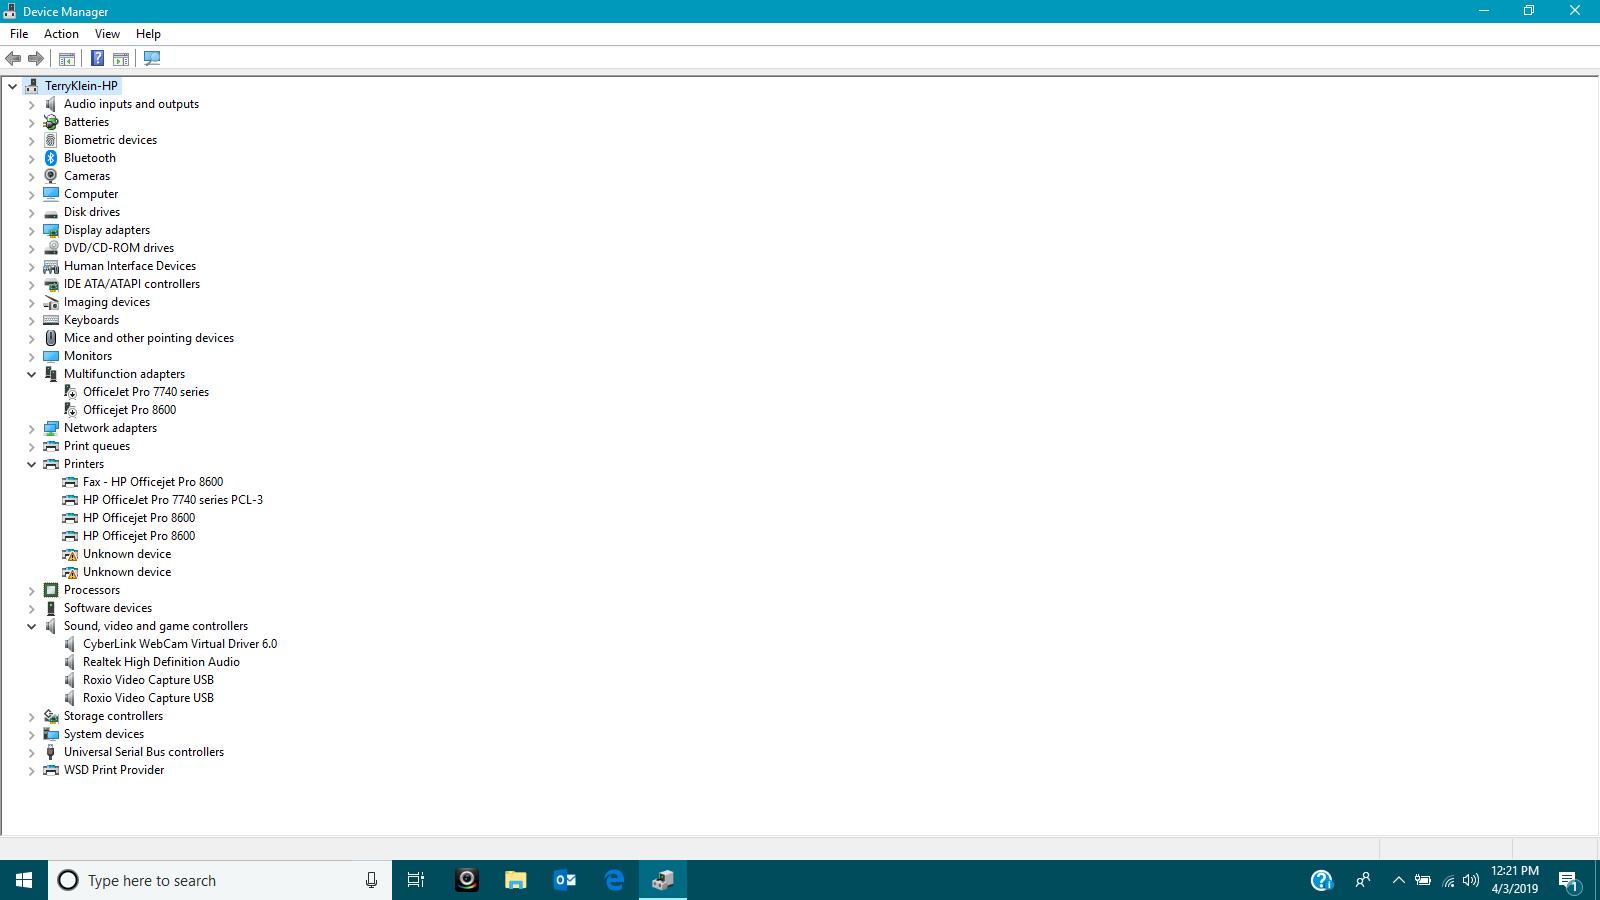 cyberlink webcam virtual driver 6.0